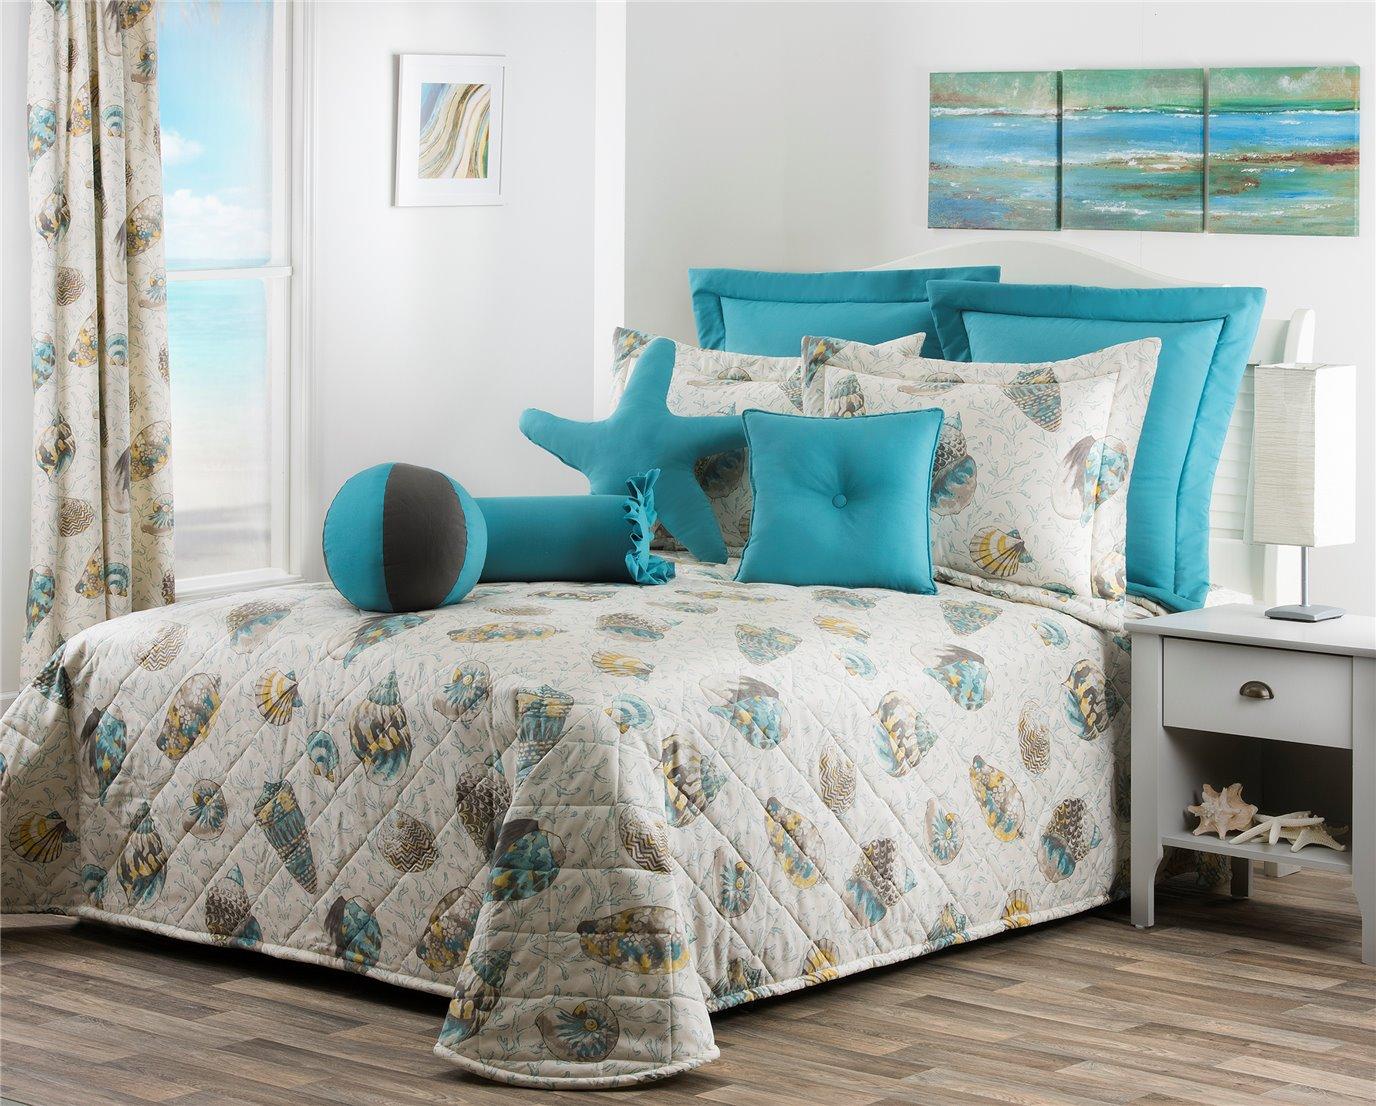 Seaside Treasures Caribbean Twin Bedspread